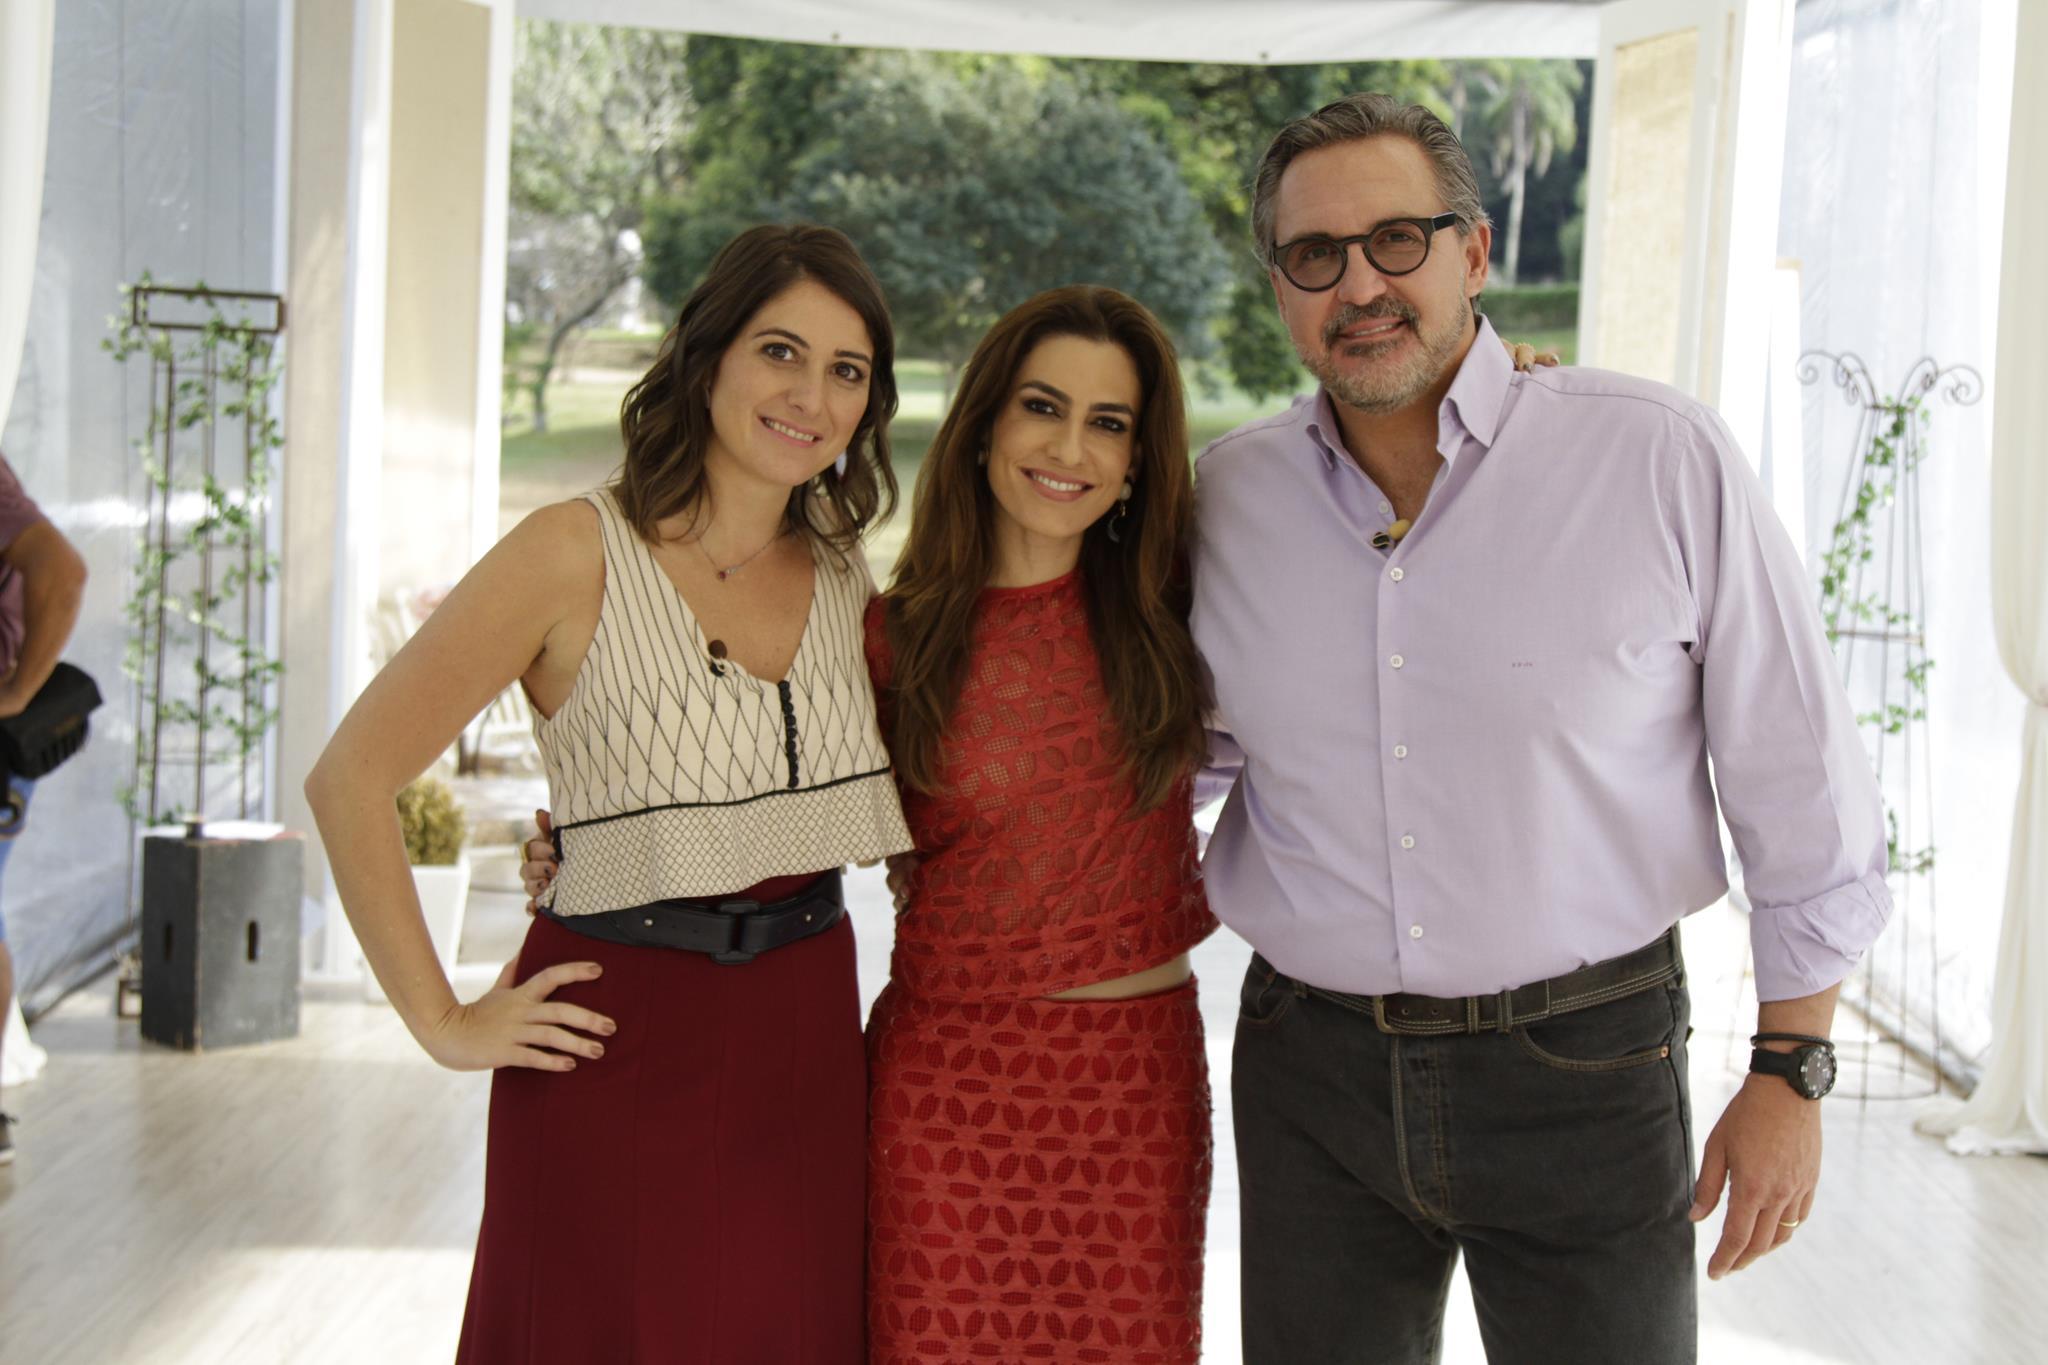 Carol Fiorentino, Ticiana Villas Boas e Fabrizio Fasano Jr. (Fotos Gabriel Gabe/SBT)